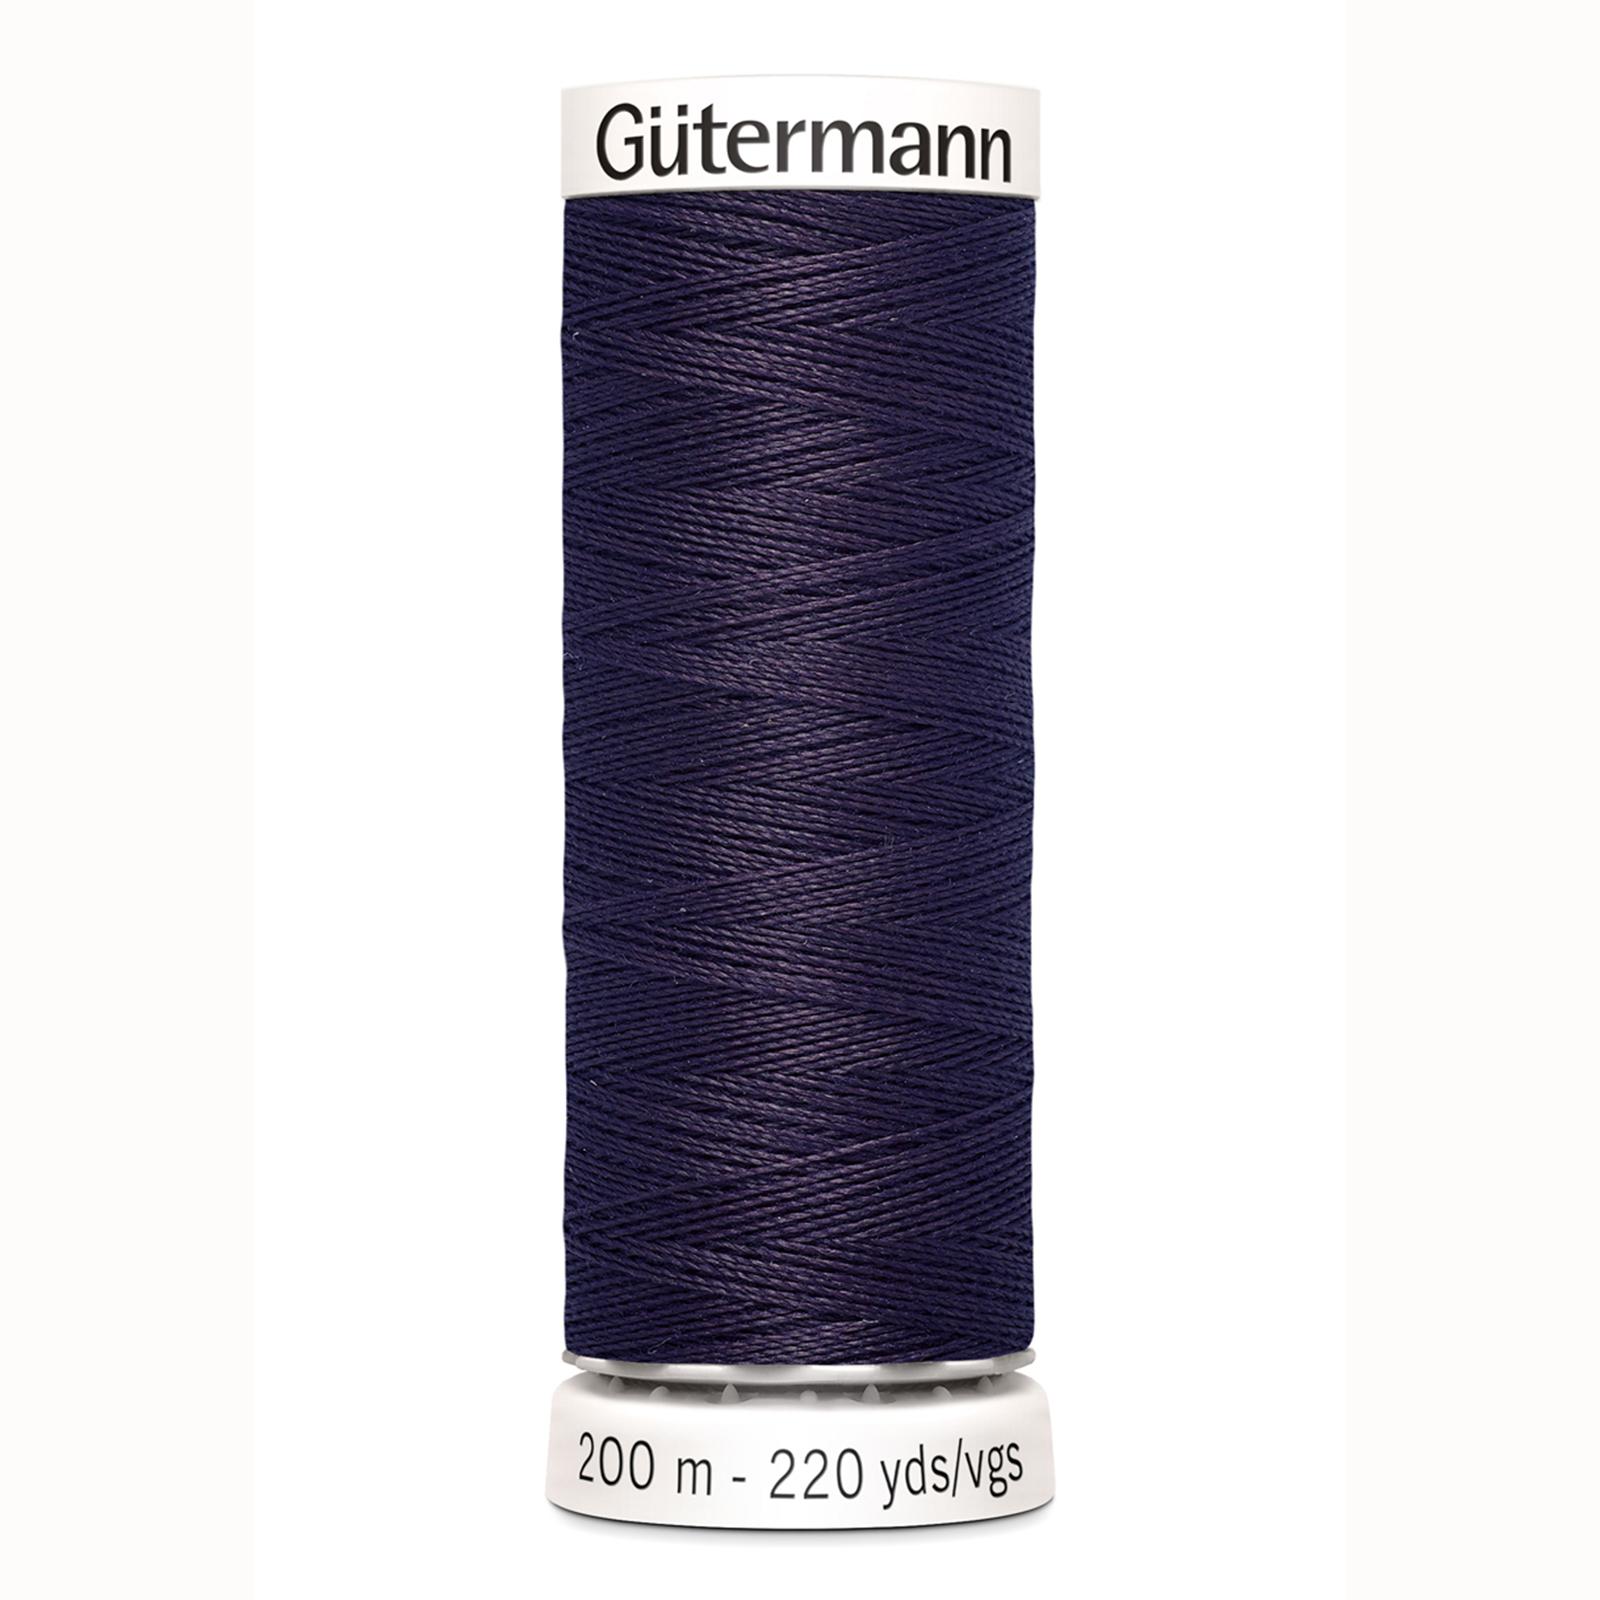 Gutermann Polyestr 200m-512